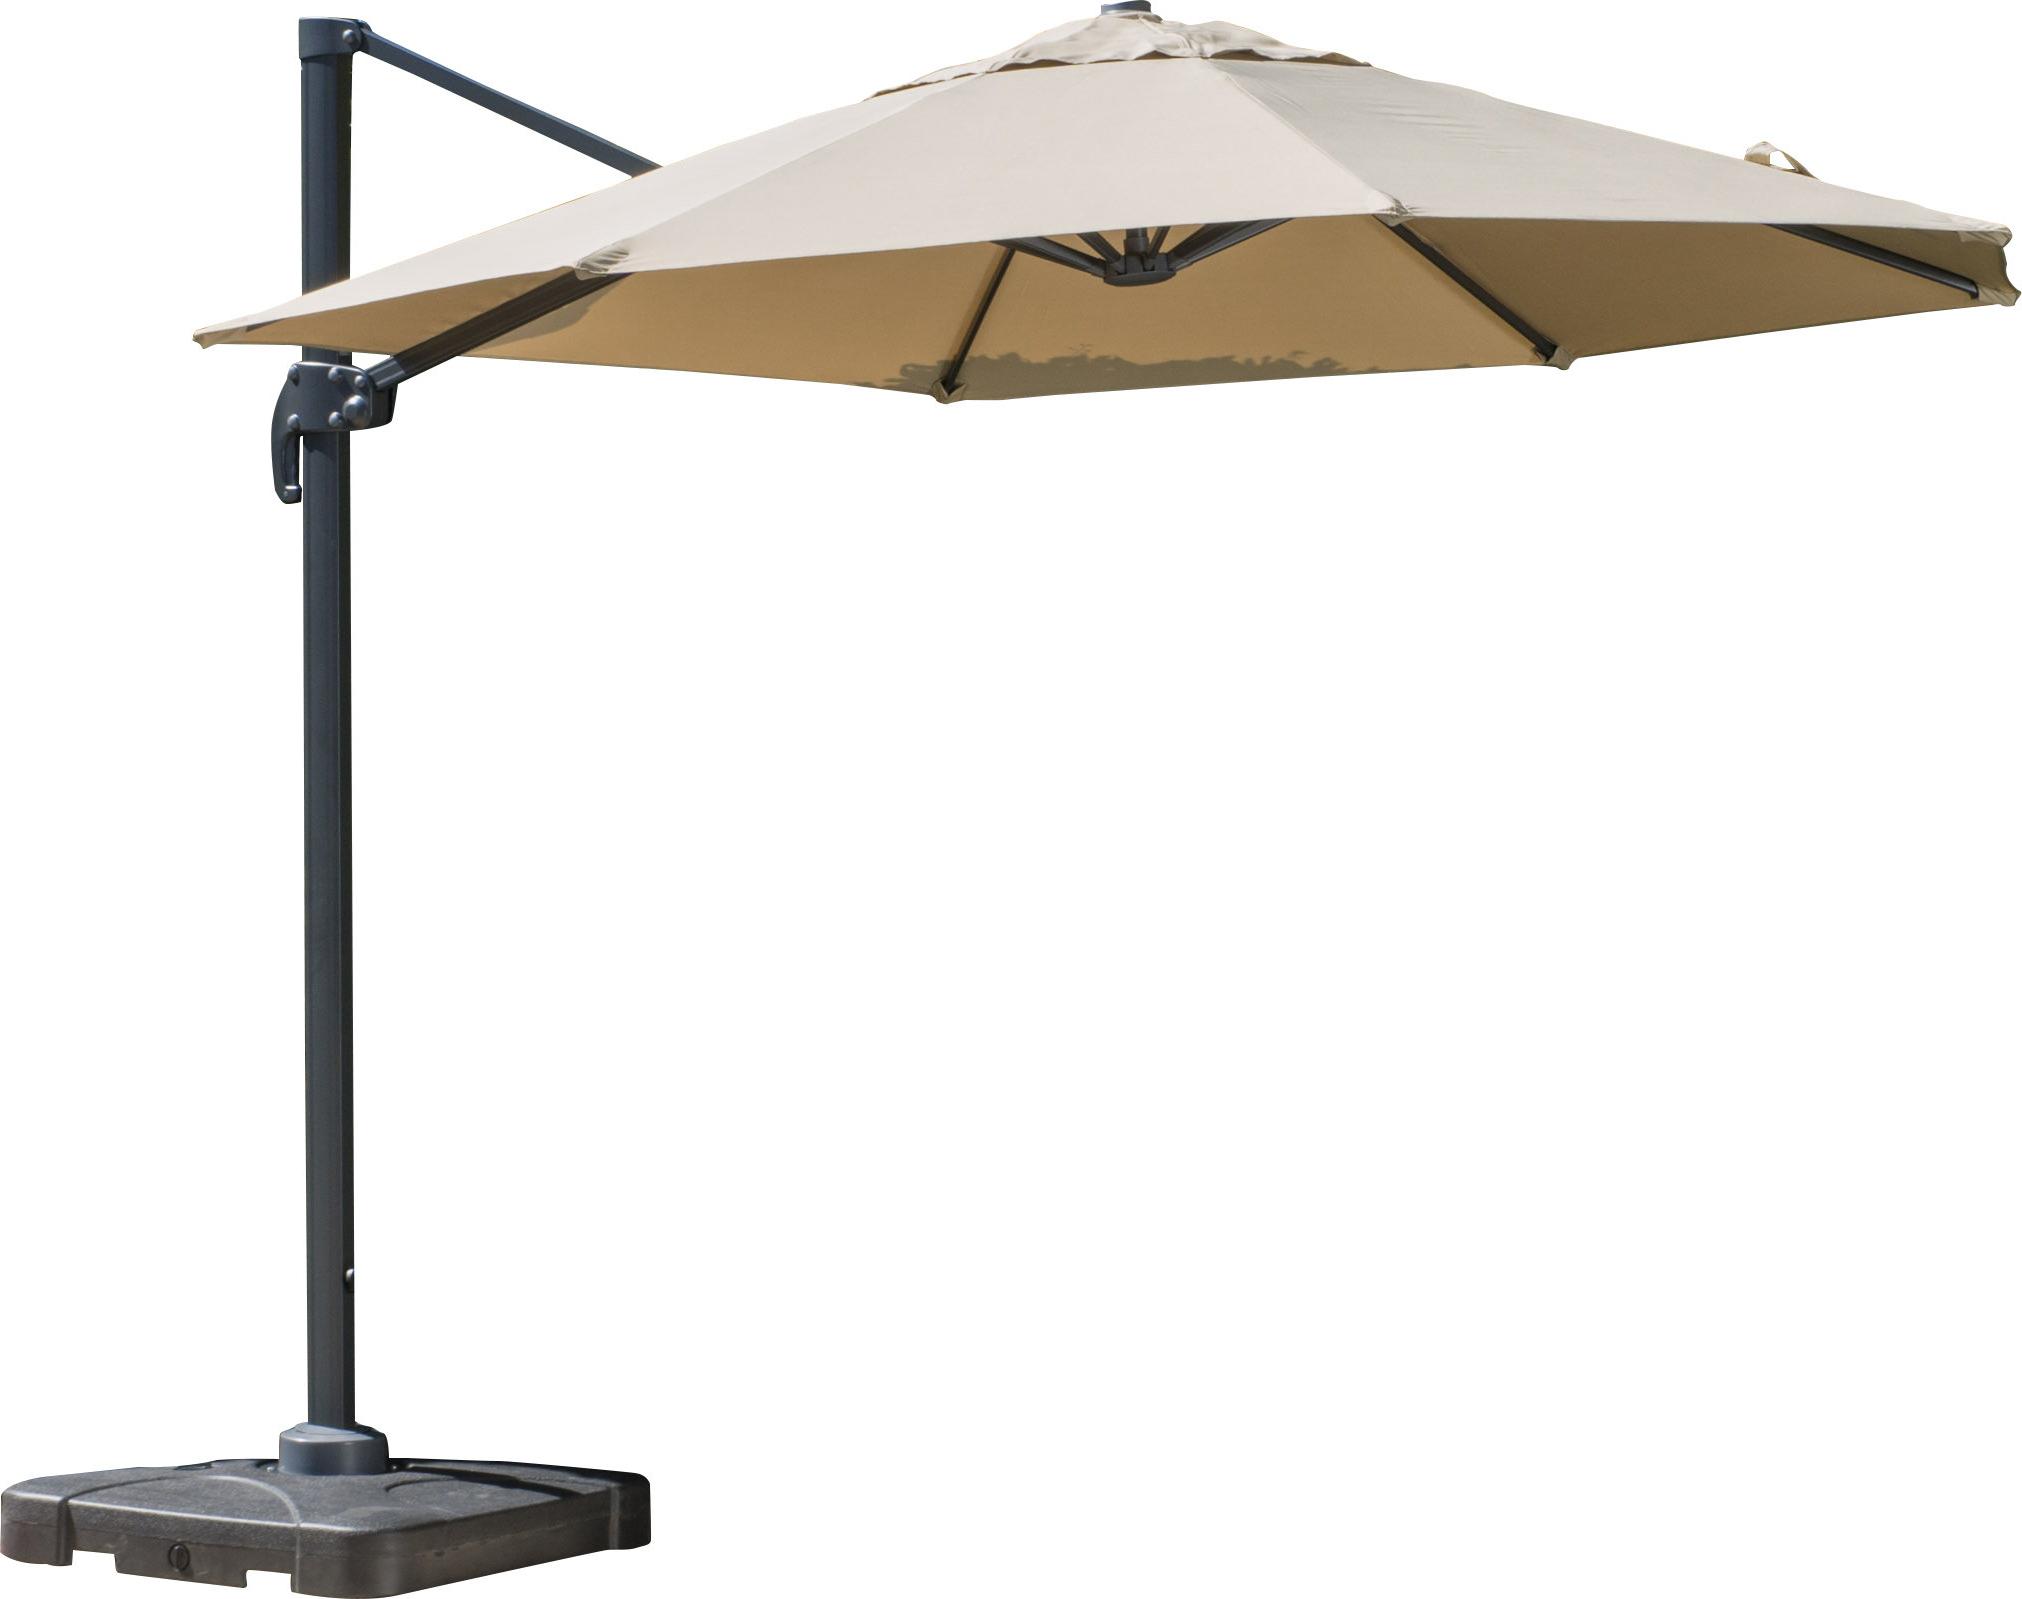 Latest Bellana Cantilever Umbrella In Boracay Square Cantilever Umbrellas (View 10 of 20)